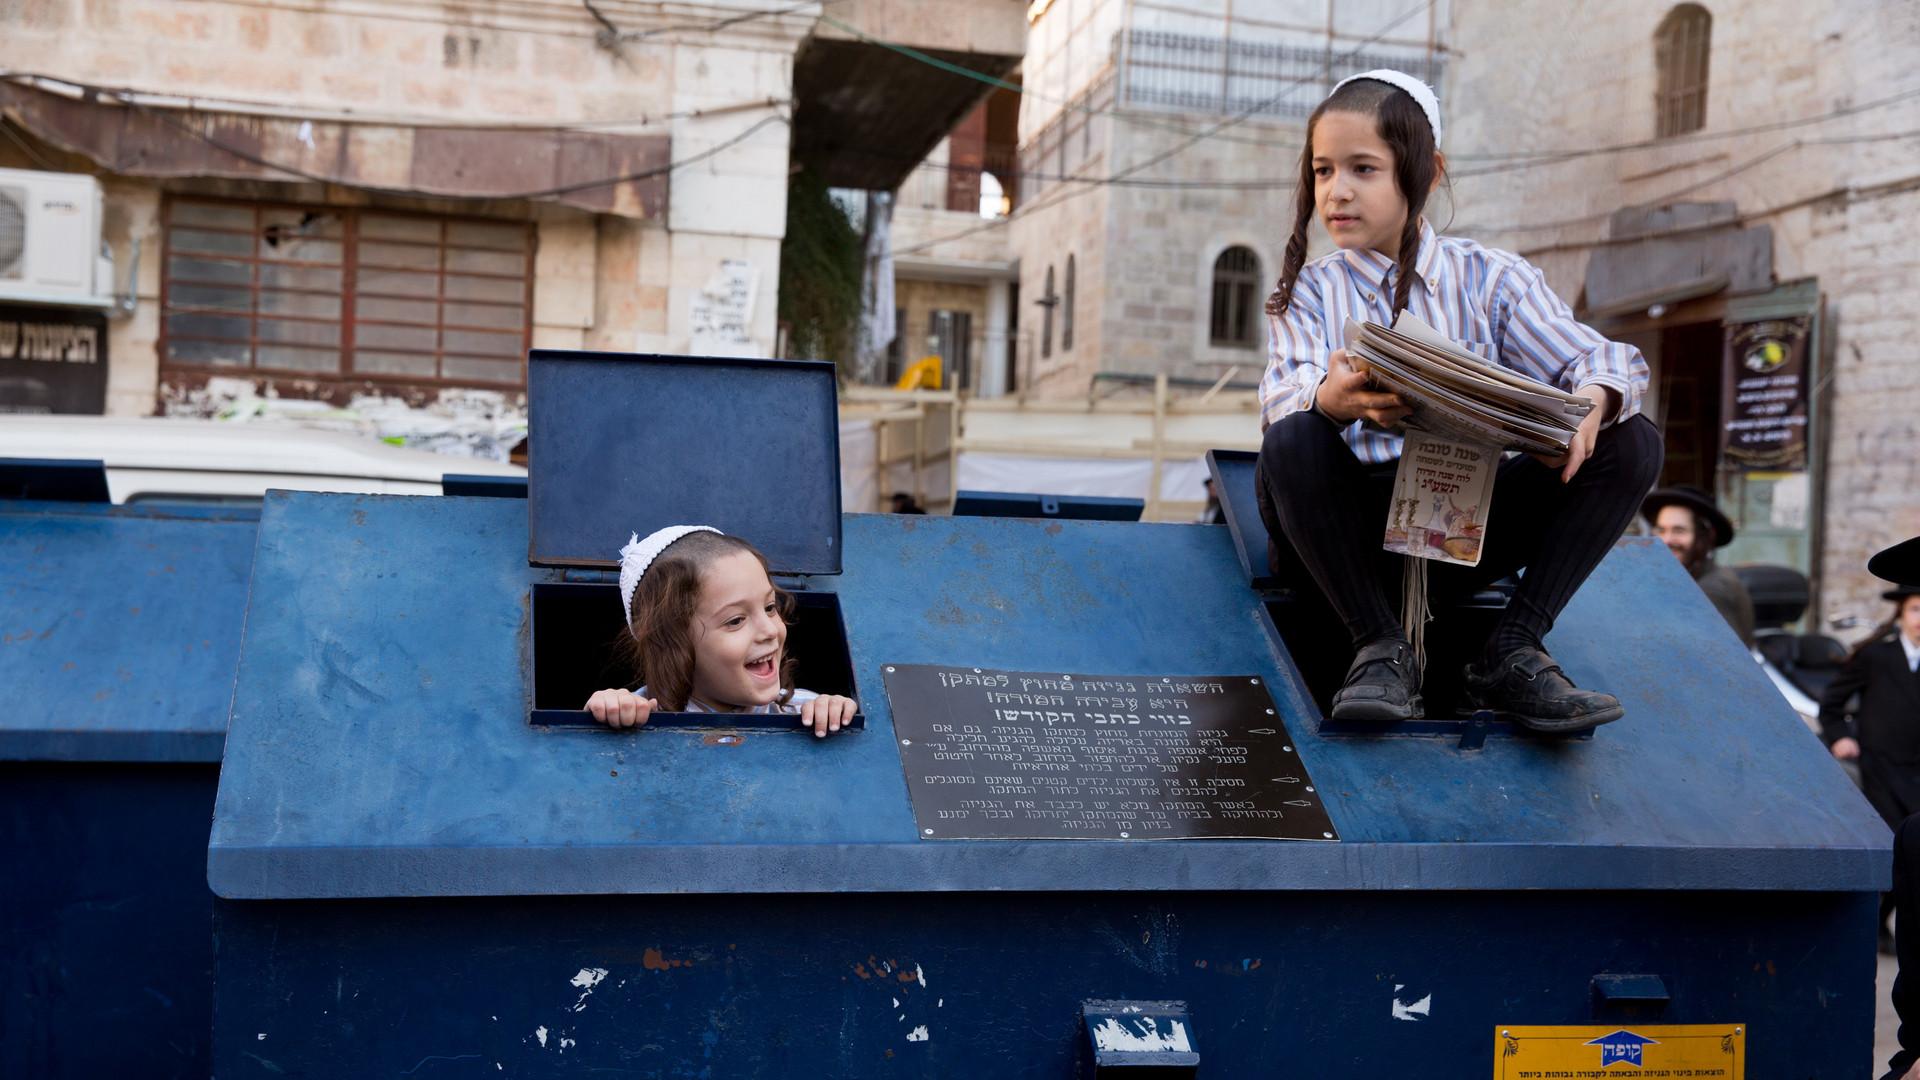 70 Faces Print #4 - Jerusalem, Israel Sep. 2012